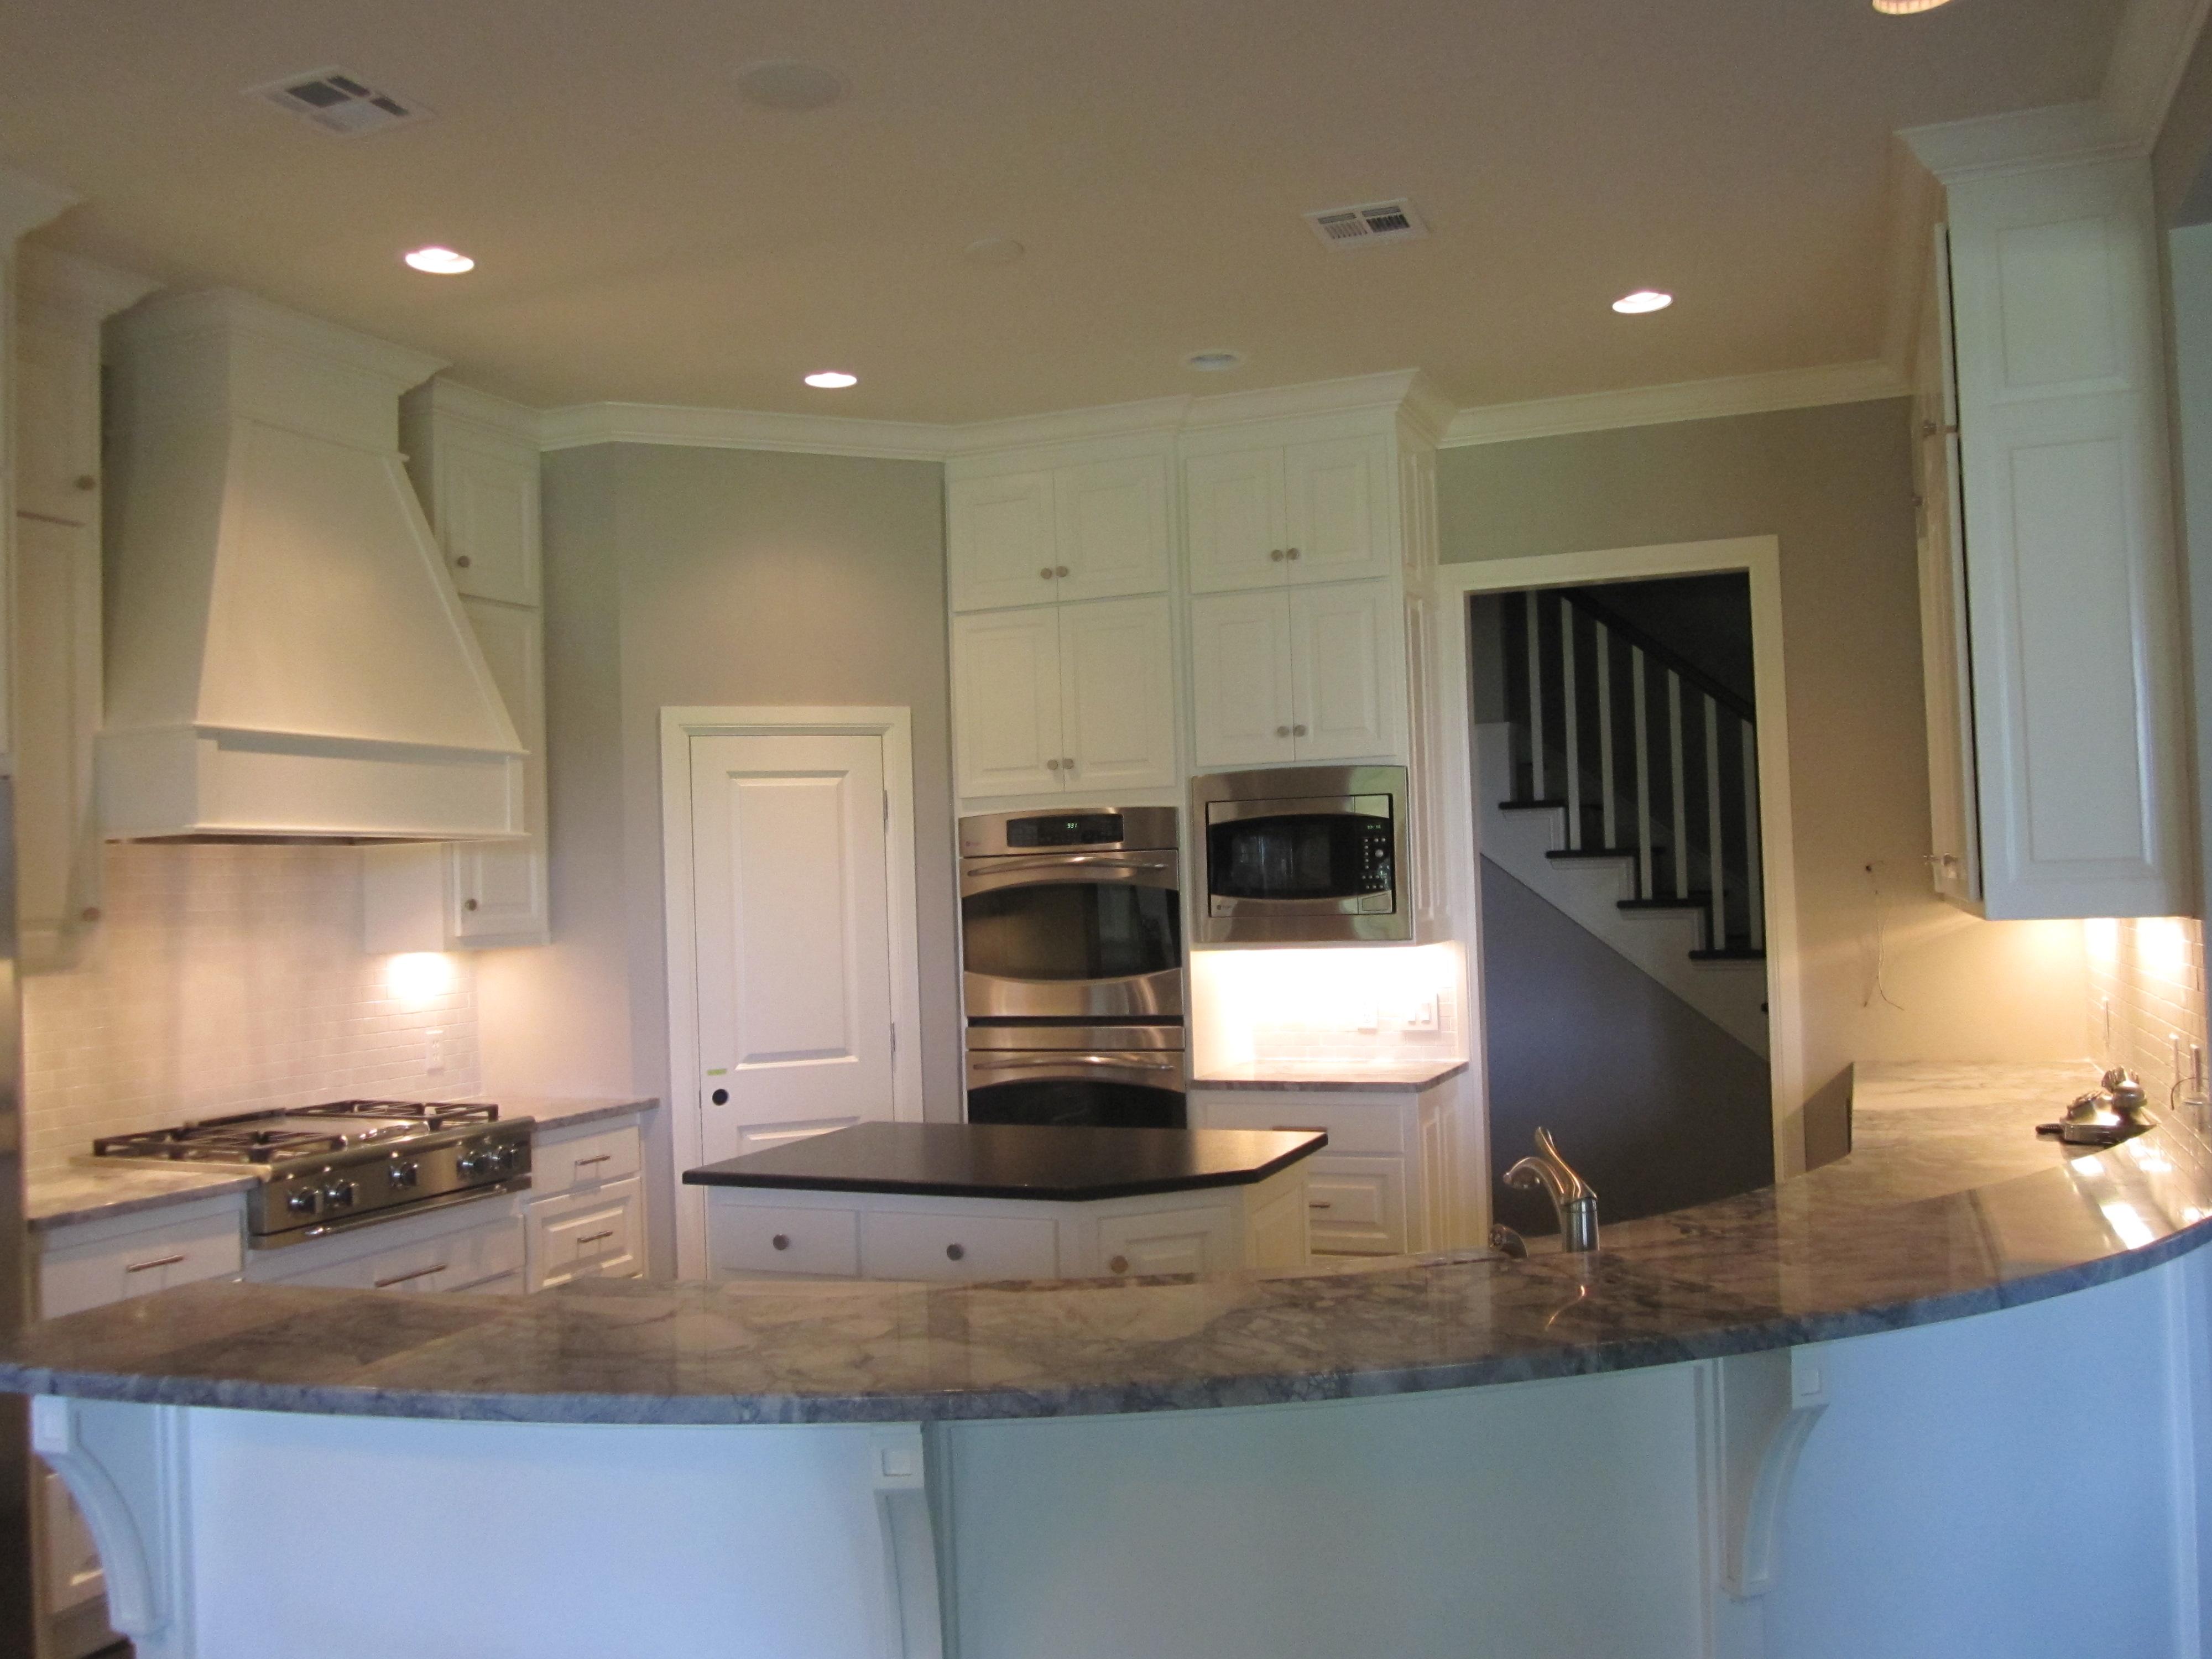 The house that matt built part i the tiger lilies - Capital kitchen appliances ...